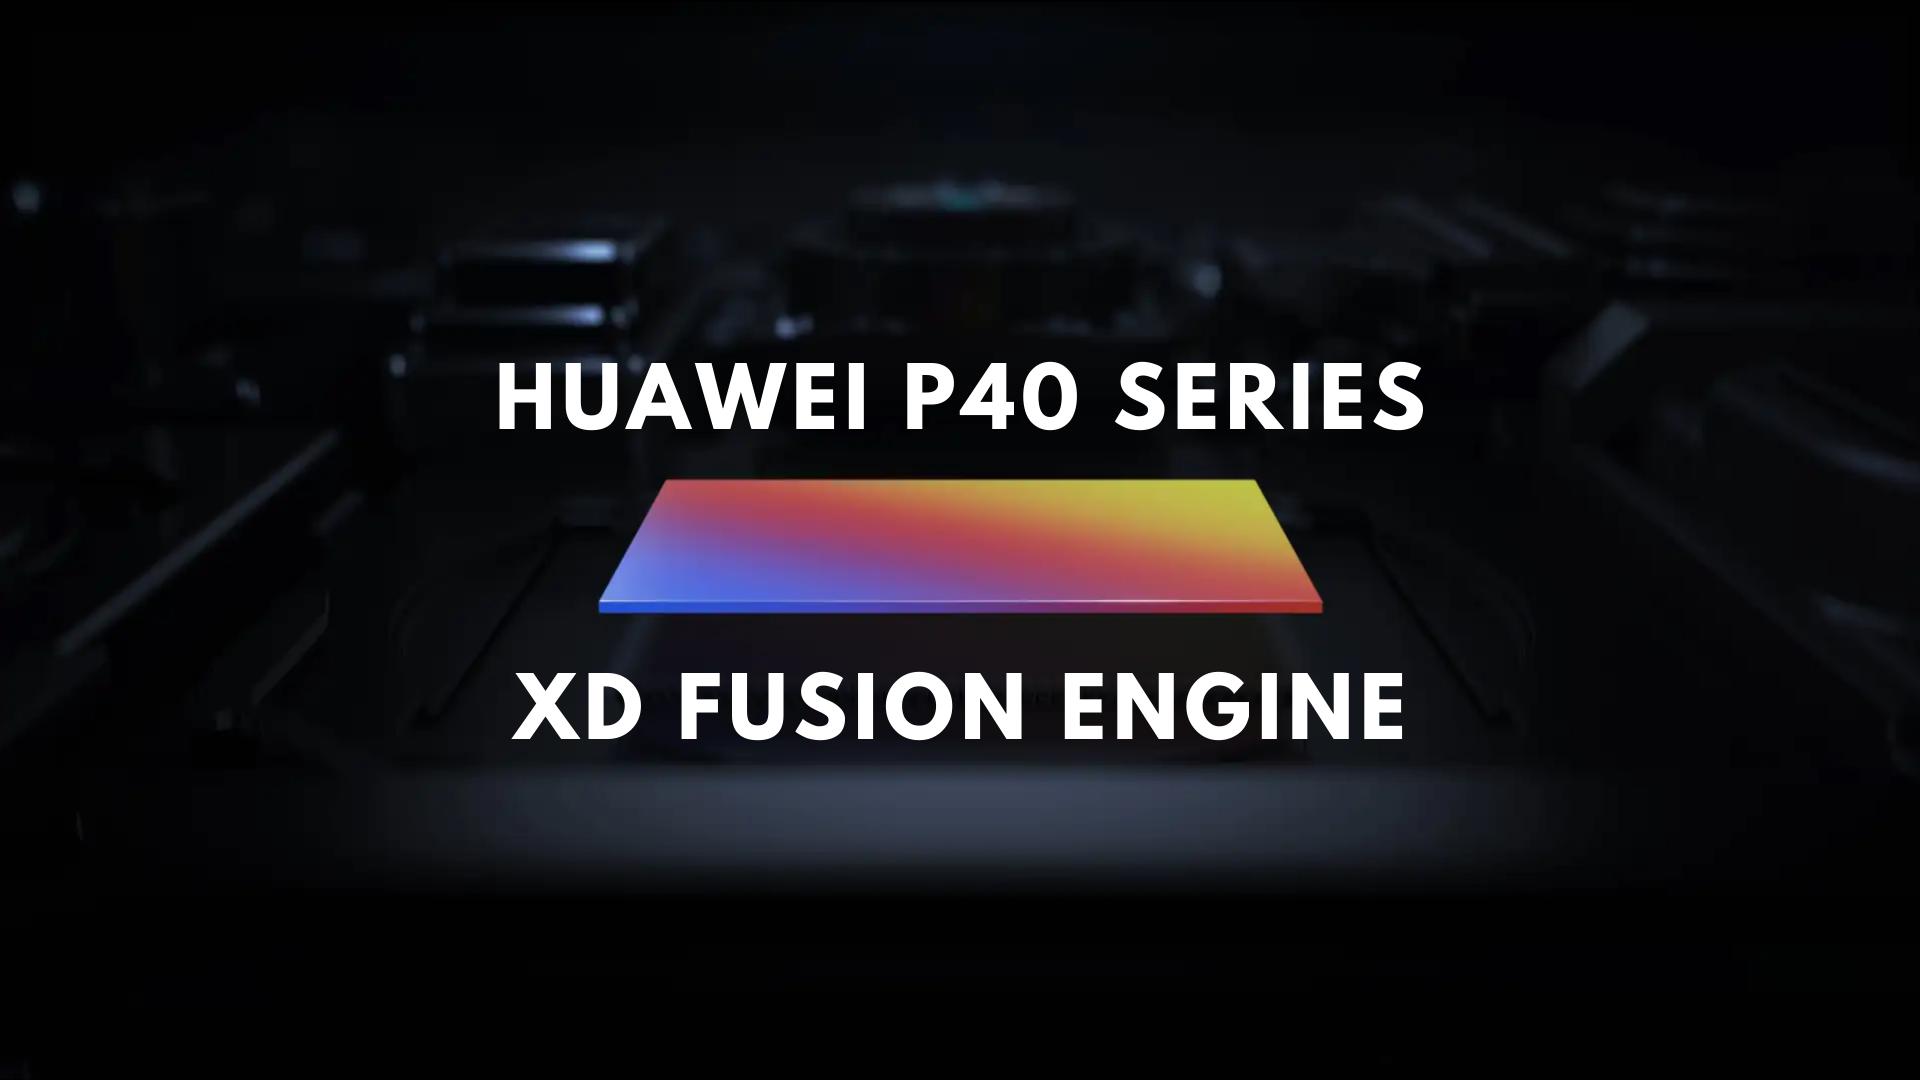 Huawei XD Fusion Engine